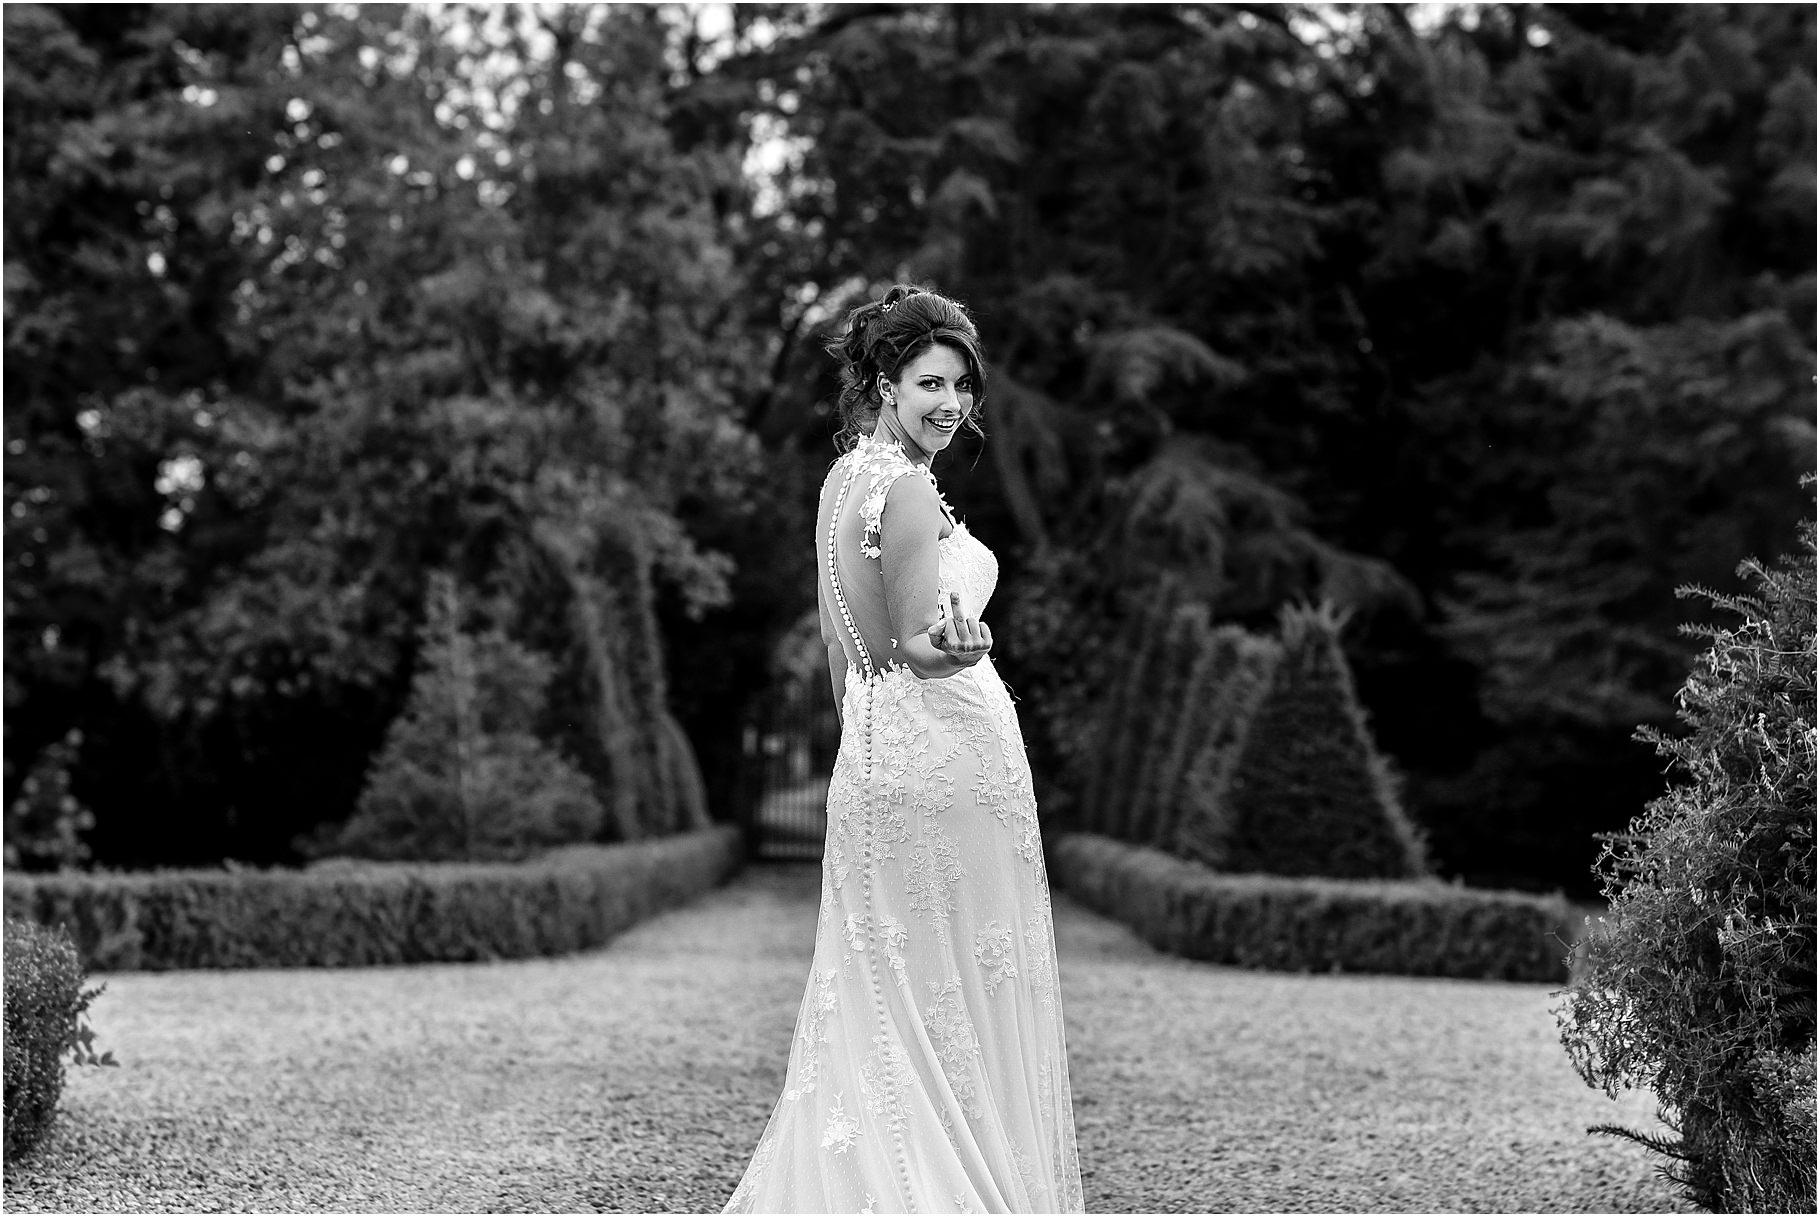 dan-wootton-photography-2017-weddings-049.jpg